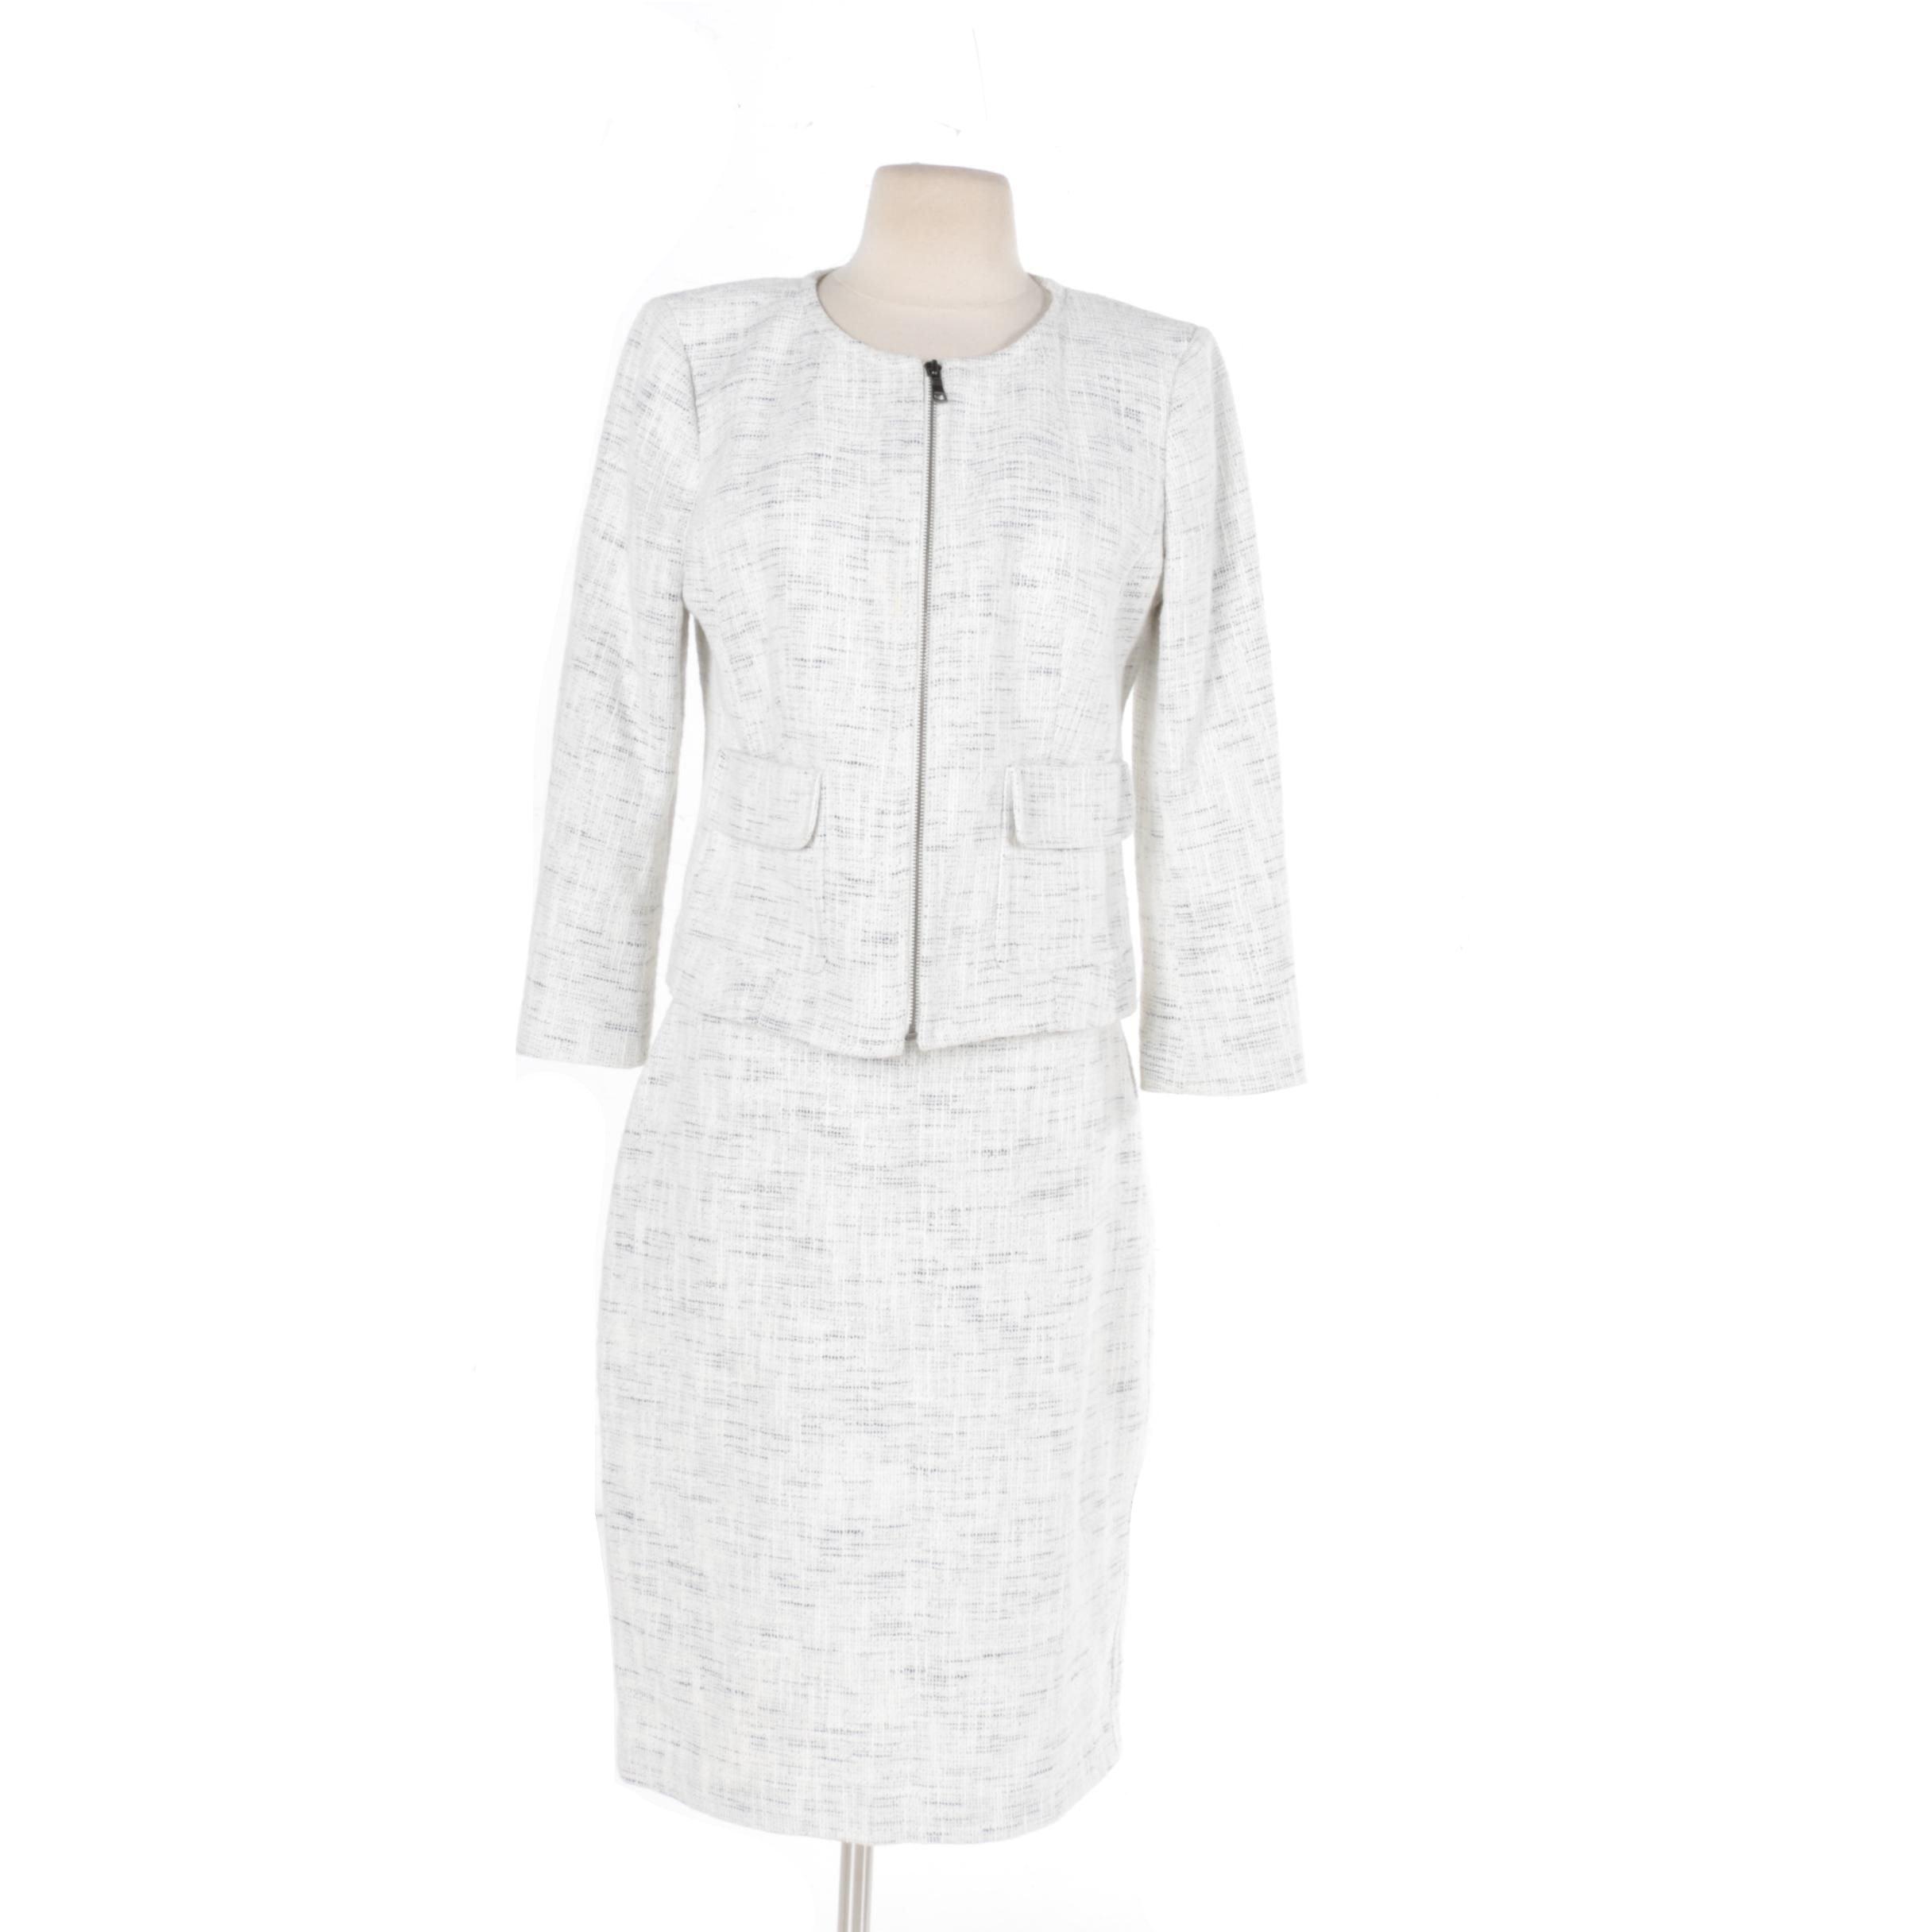 Ann Taylor White Skirt Suit